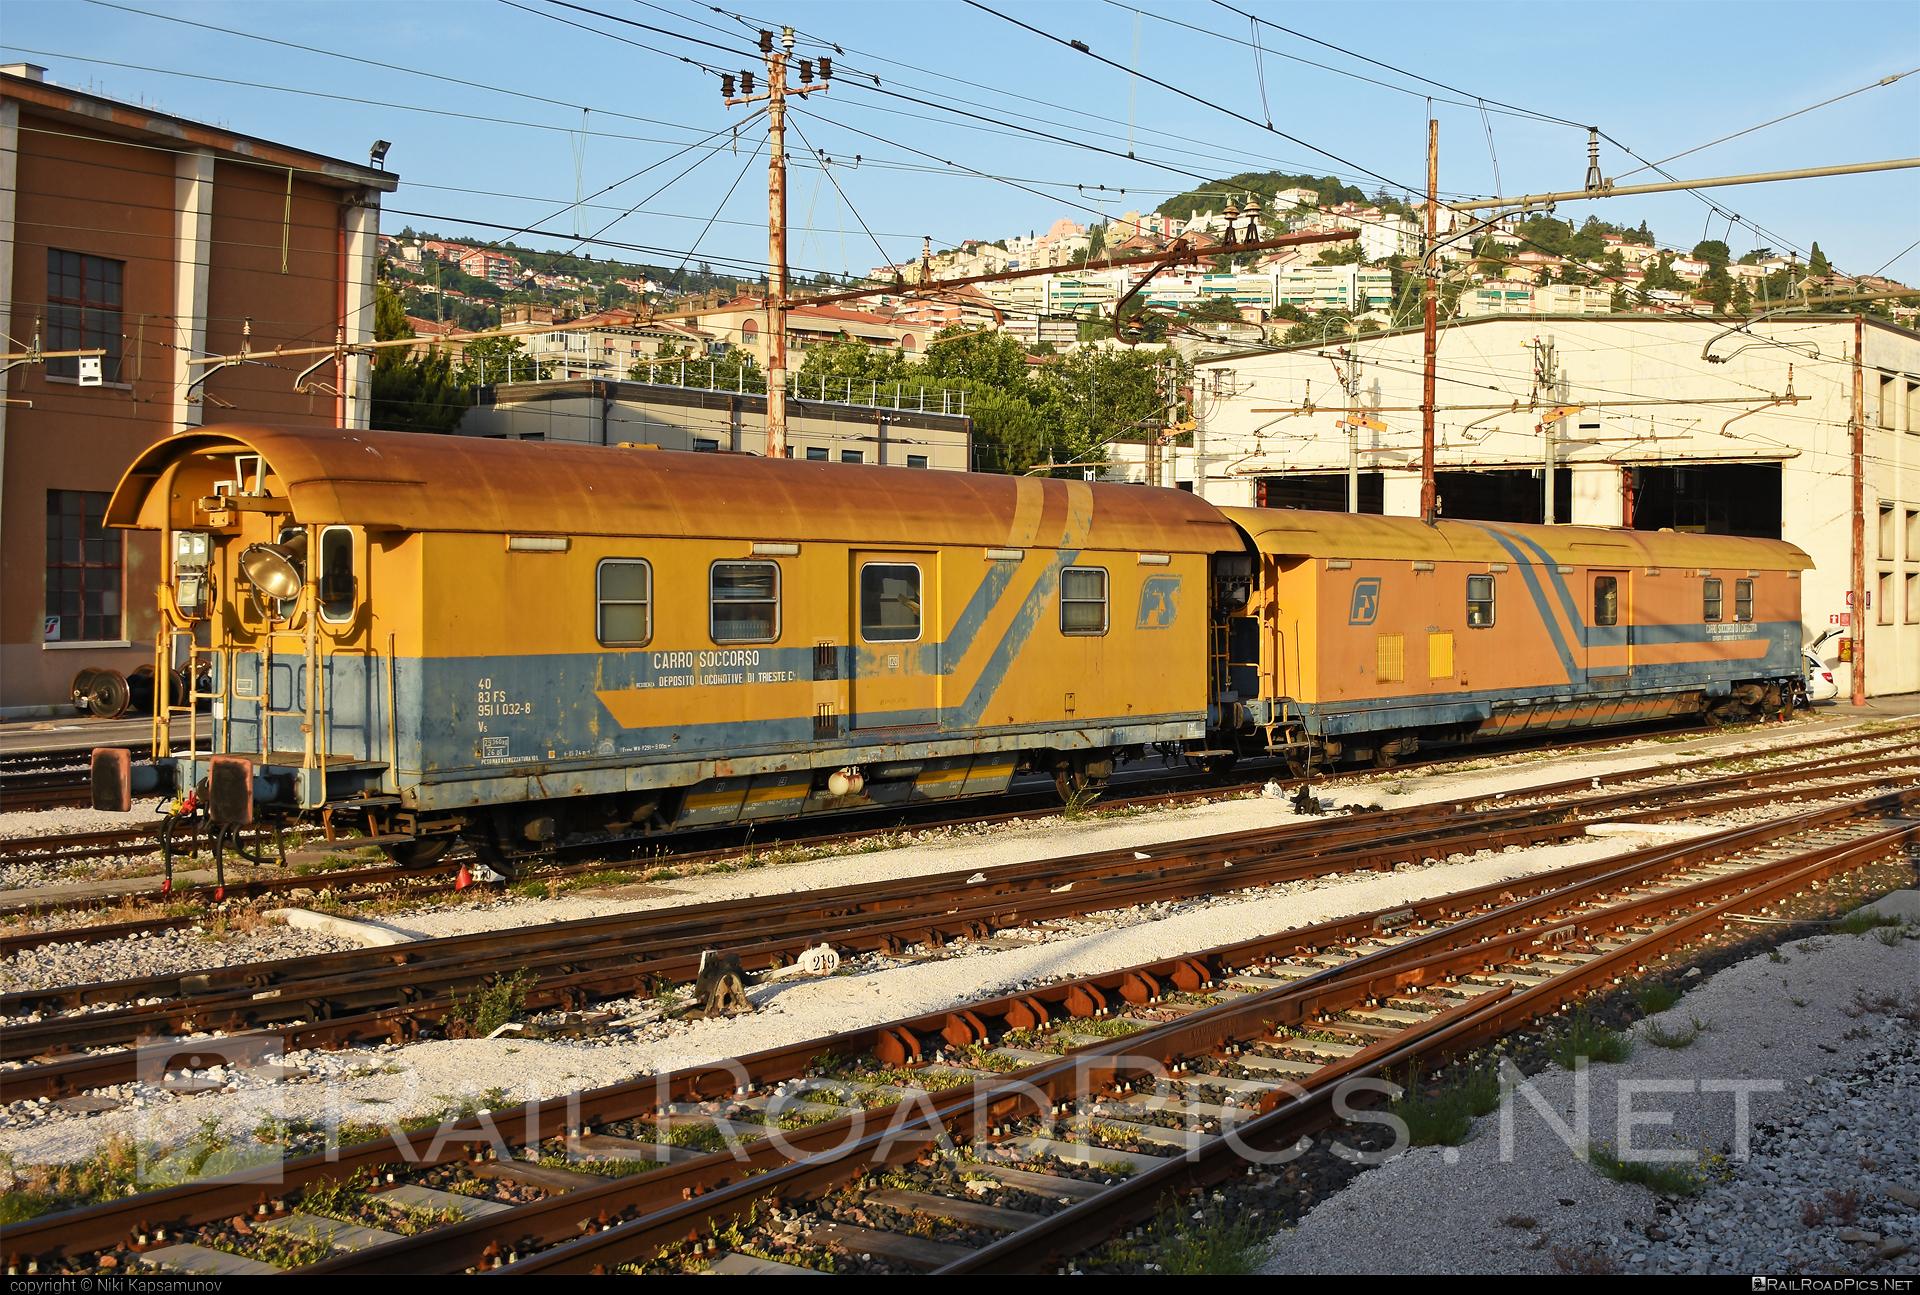 Class V - Vs 951 - 9511 032-8 operated by Ferrovie dello Stato Italiane #FerrovieDelloStatoItaliane #ferroviedellostato #fs #fsitaliane